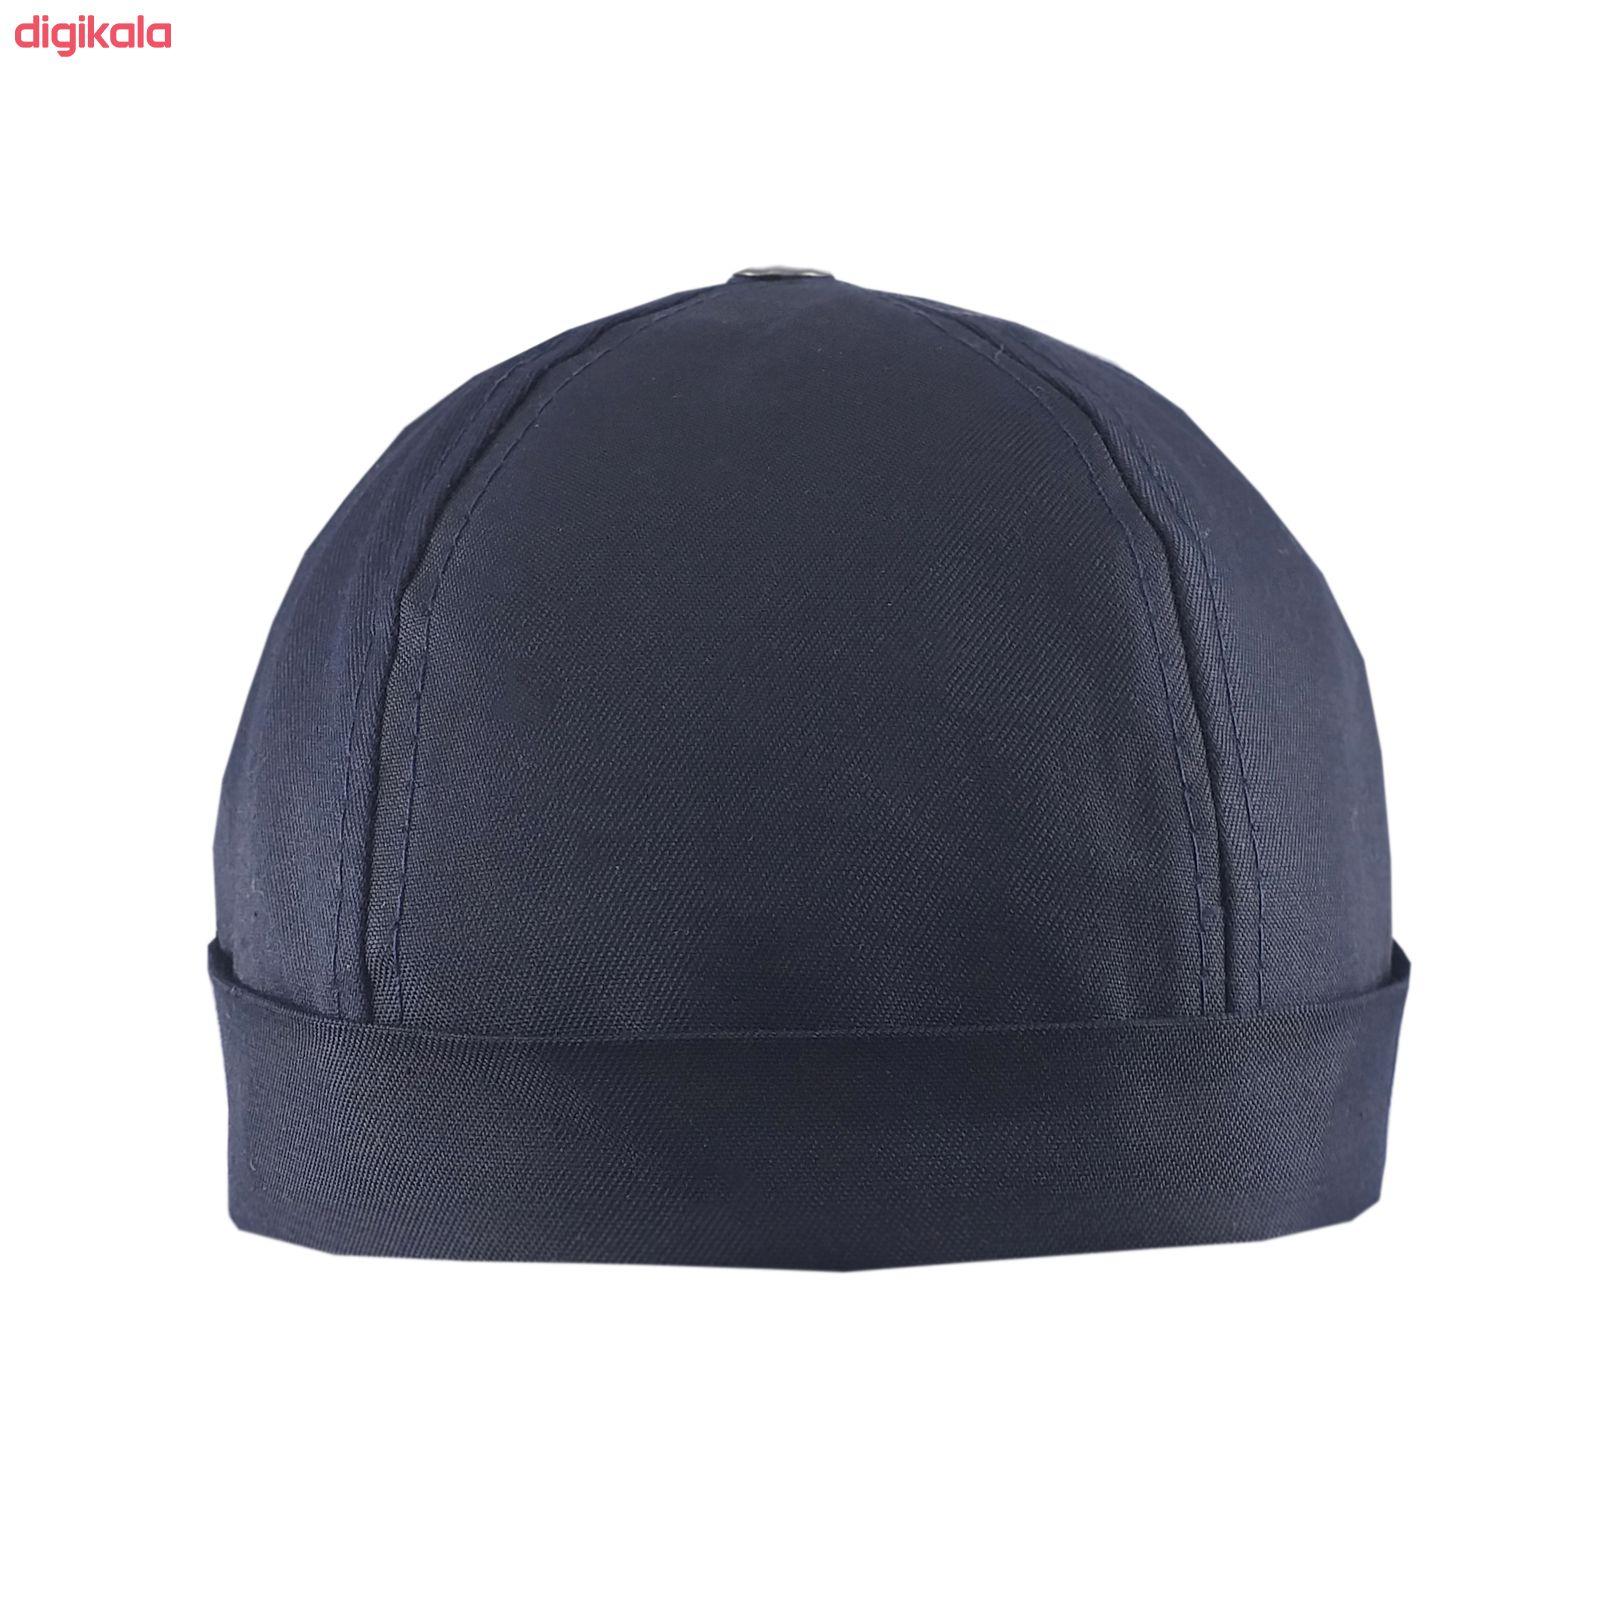 کلاه لئونی مردانه مدل BSOR77 main 1 2